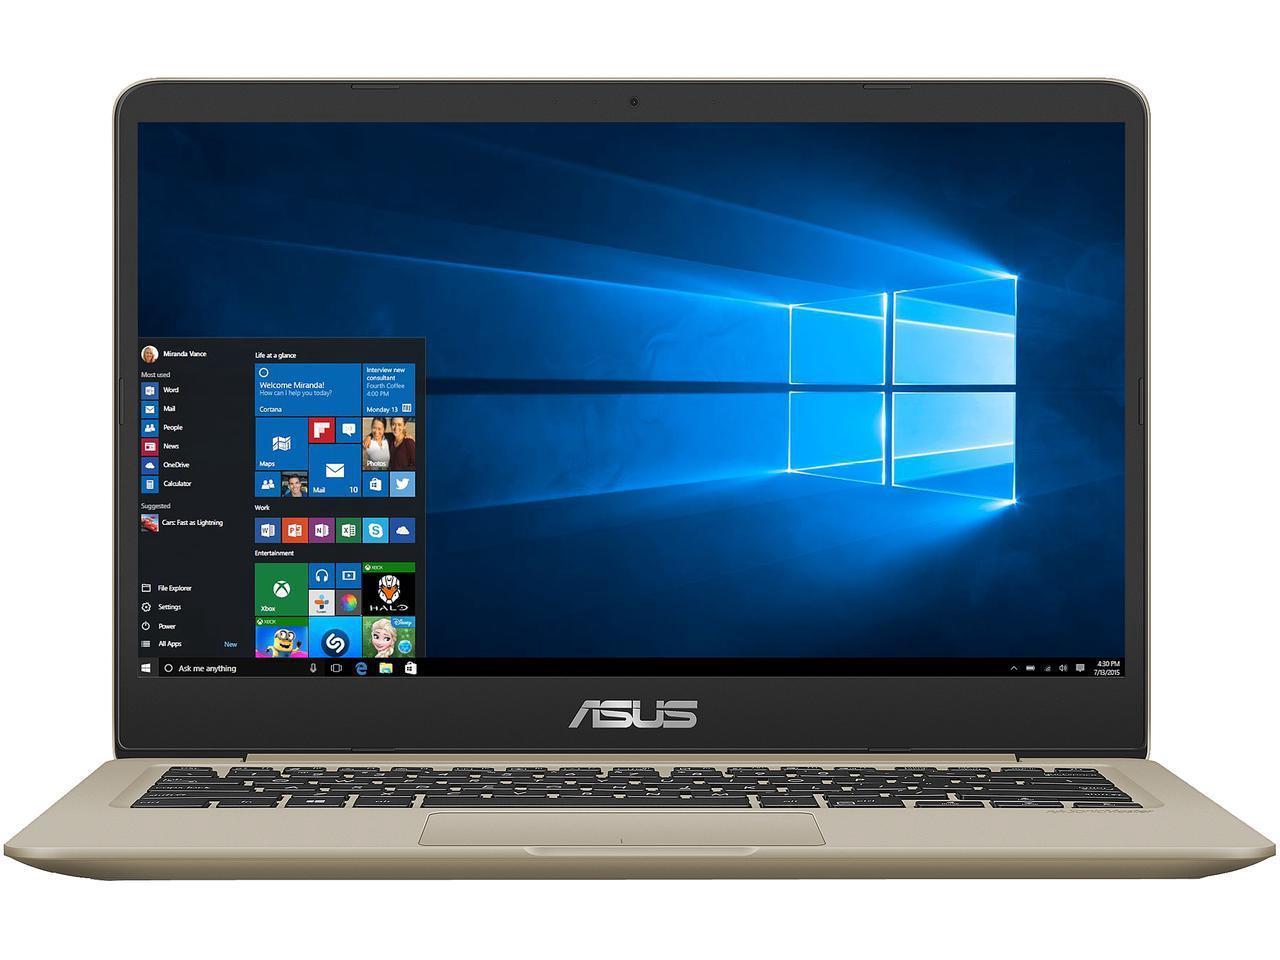 Asus VivoBook S14 S410UQ (i7-8550U, 940MX, Full HD) Laptop Review